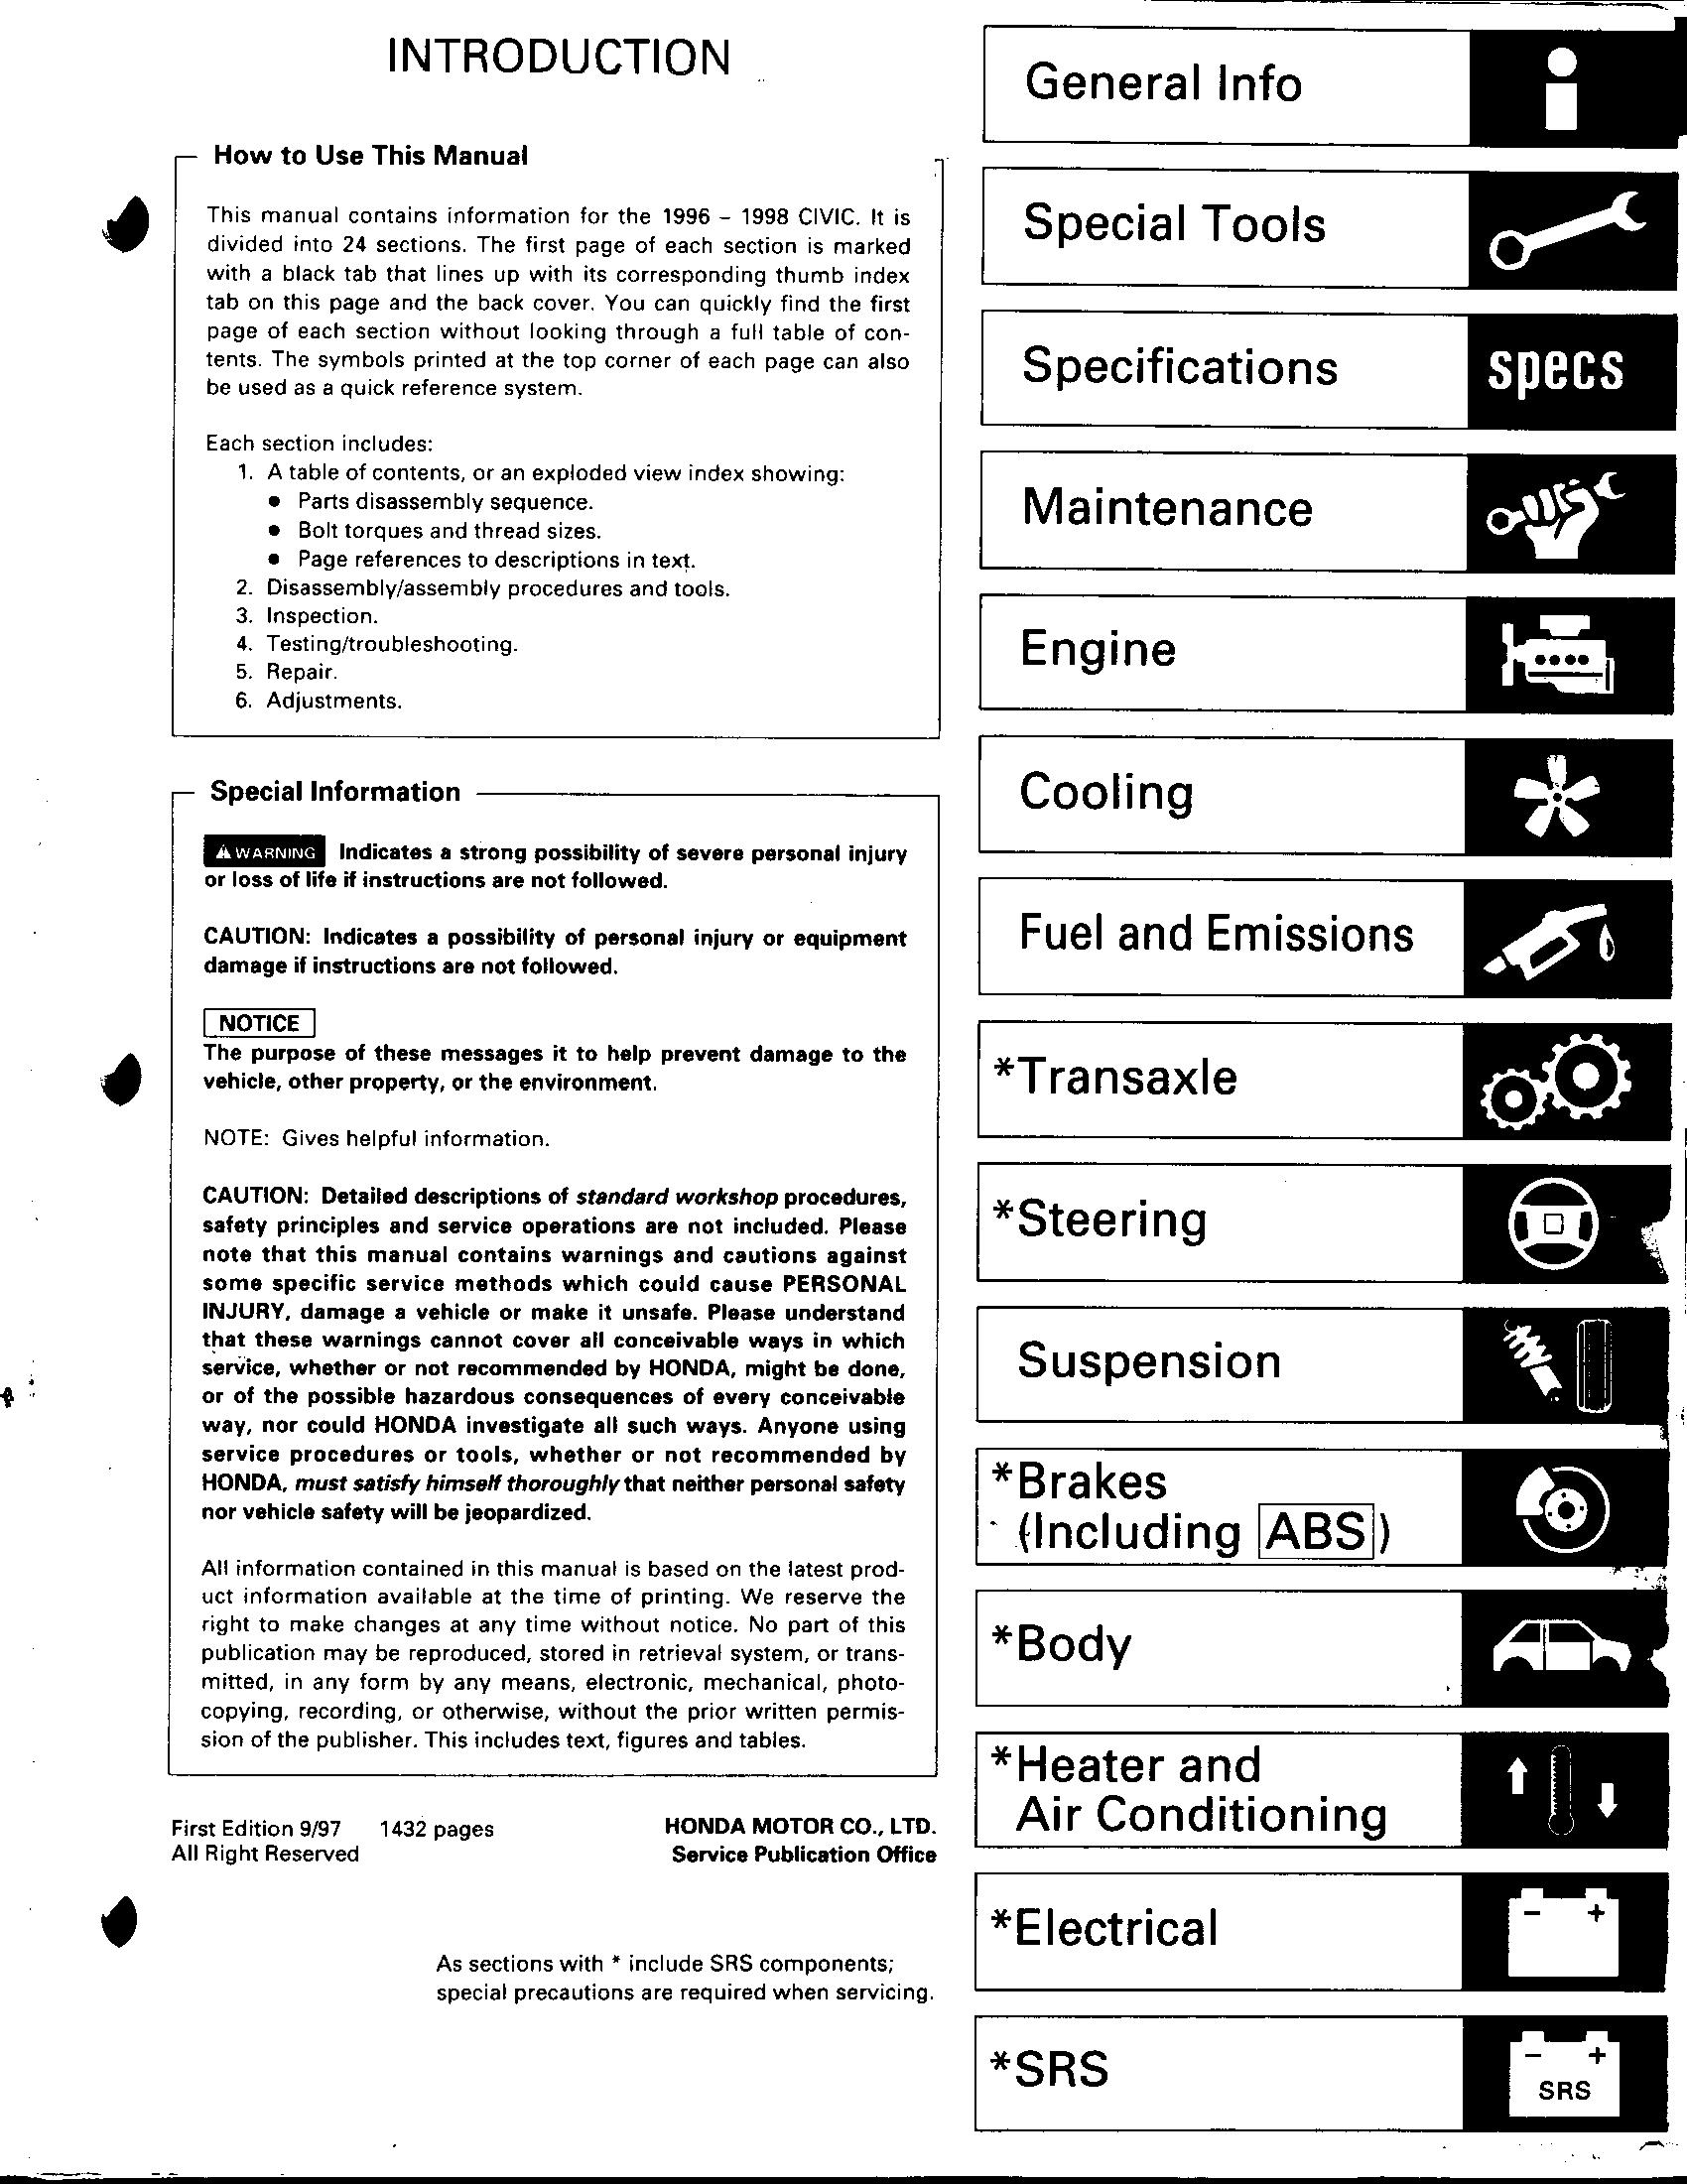 2004 toyota corolla service manual pdf